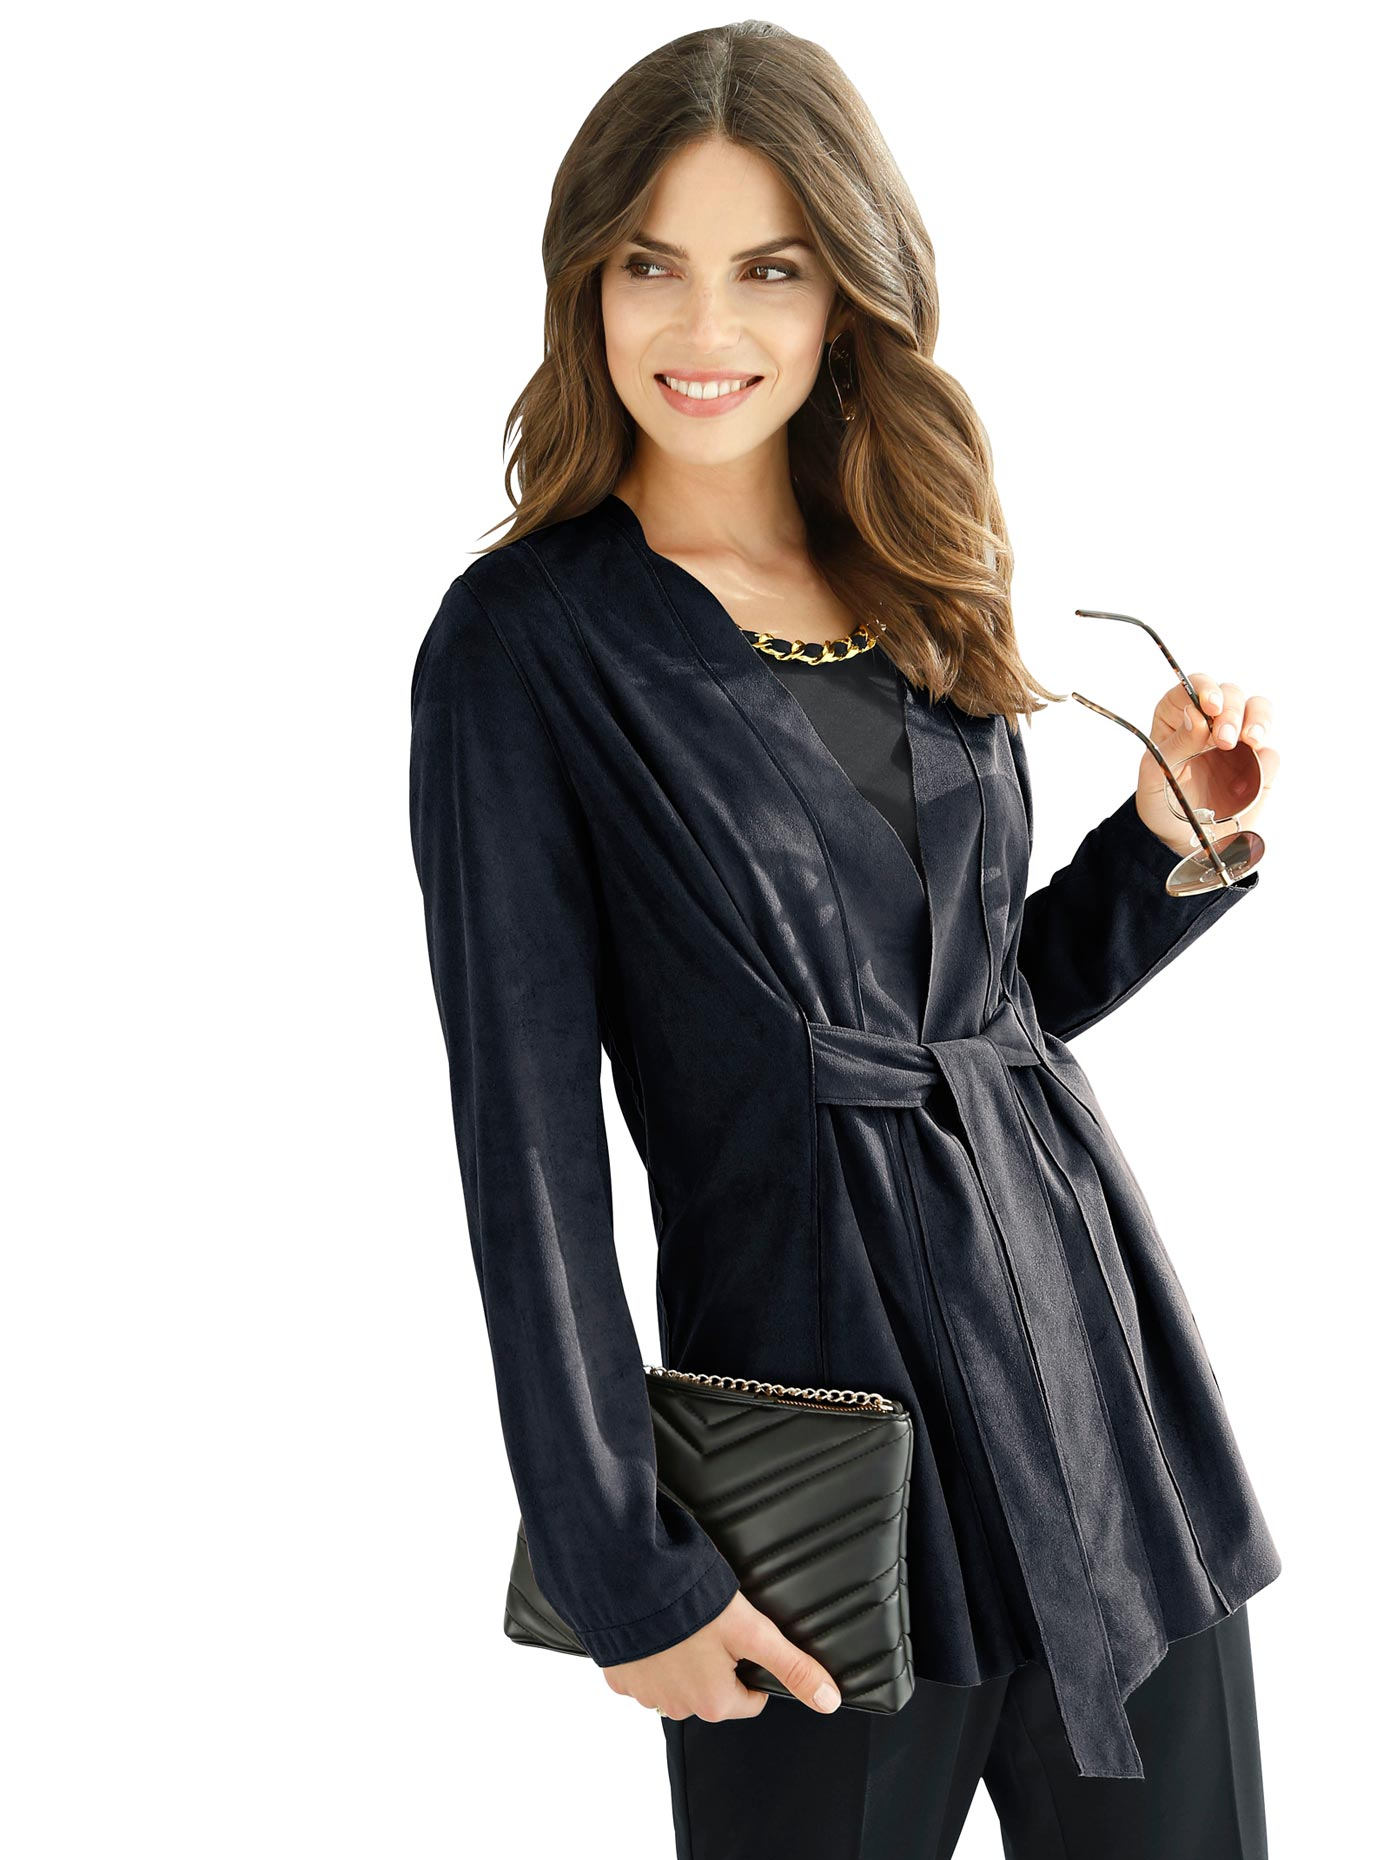 Lady Blusenblazer in Veloursleder-Optik | Bekleidung > Blazer > Blusenblazer | Lady